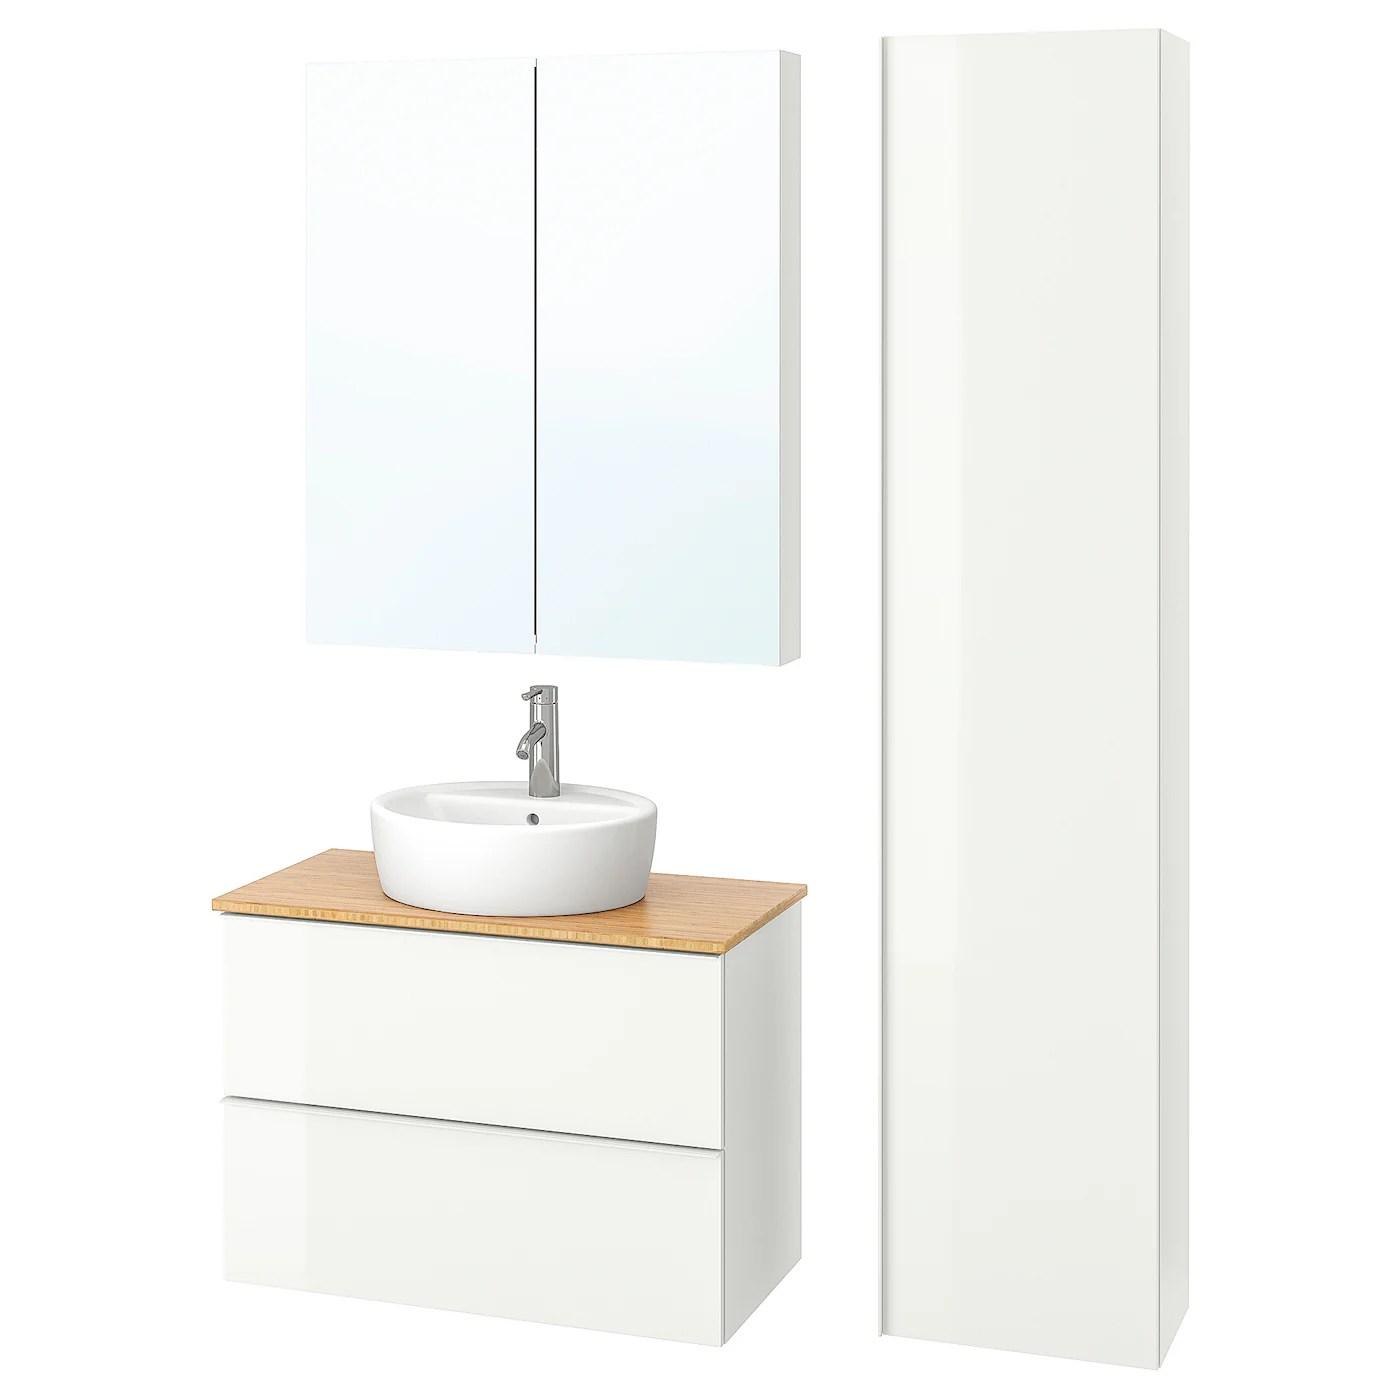 Godmorgon Tolken Tornviken Mobilier Salle De Bain 6 Pieces Brillant Blanc Bambou Dalskar Mitigeur Lavabo 82 Cm Ikea